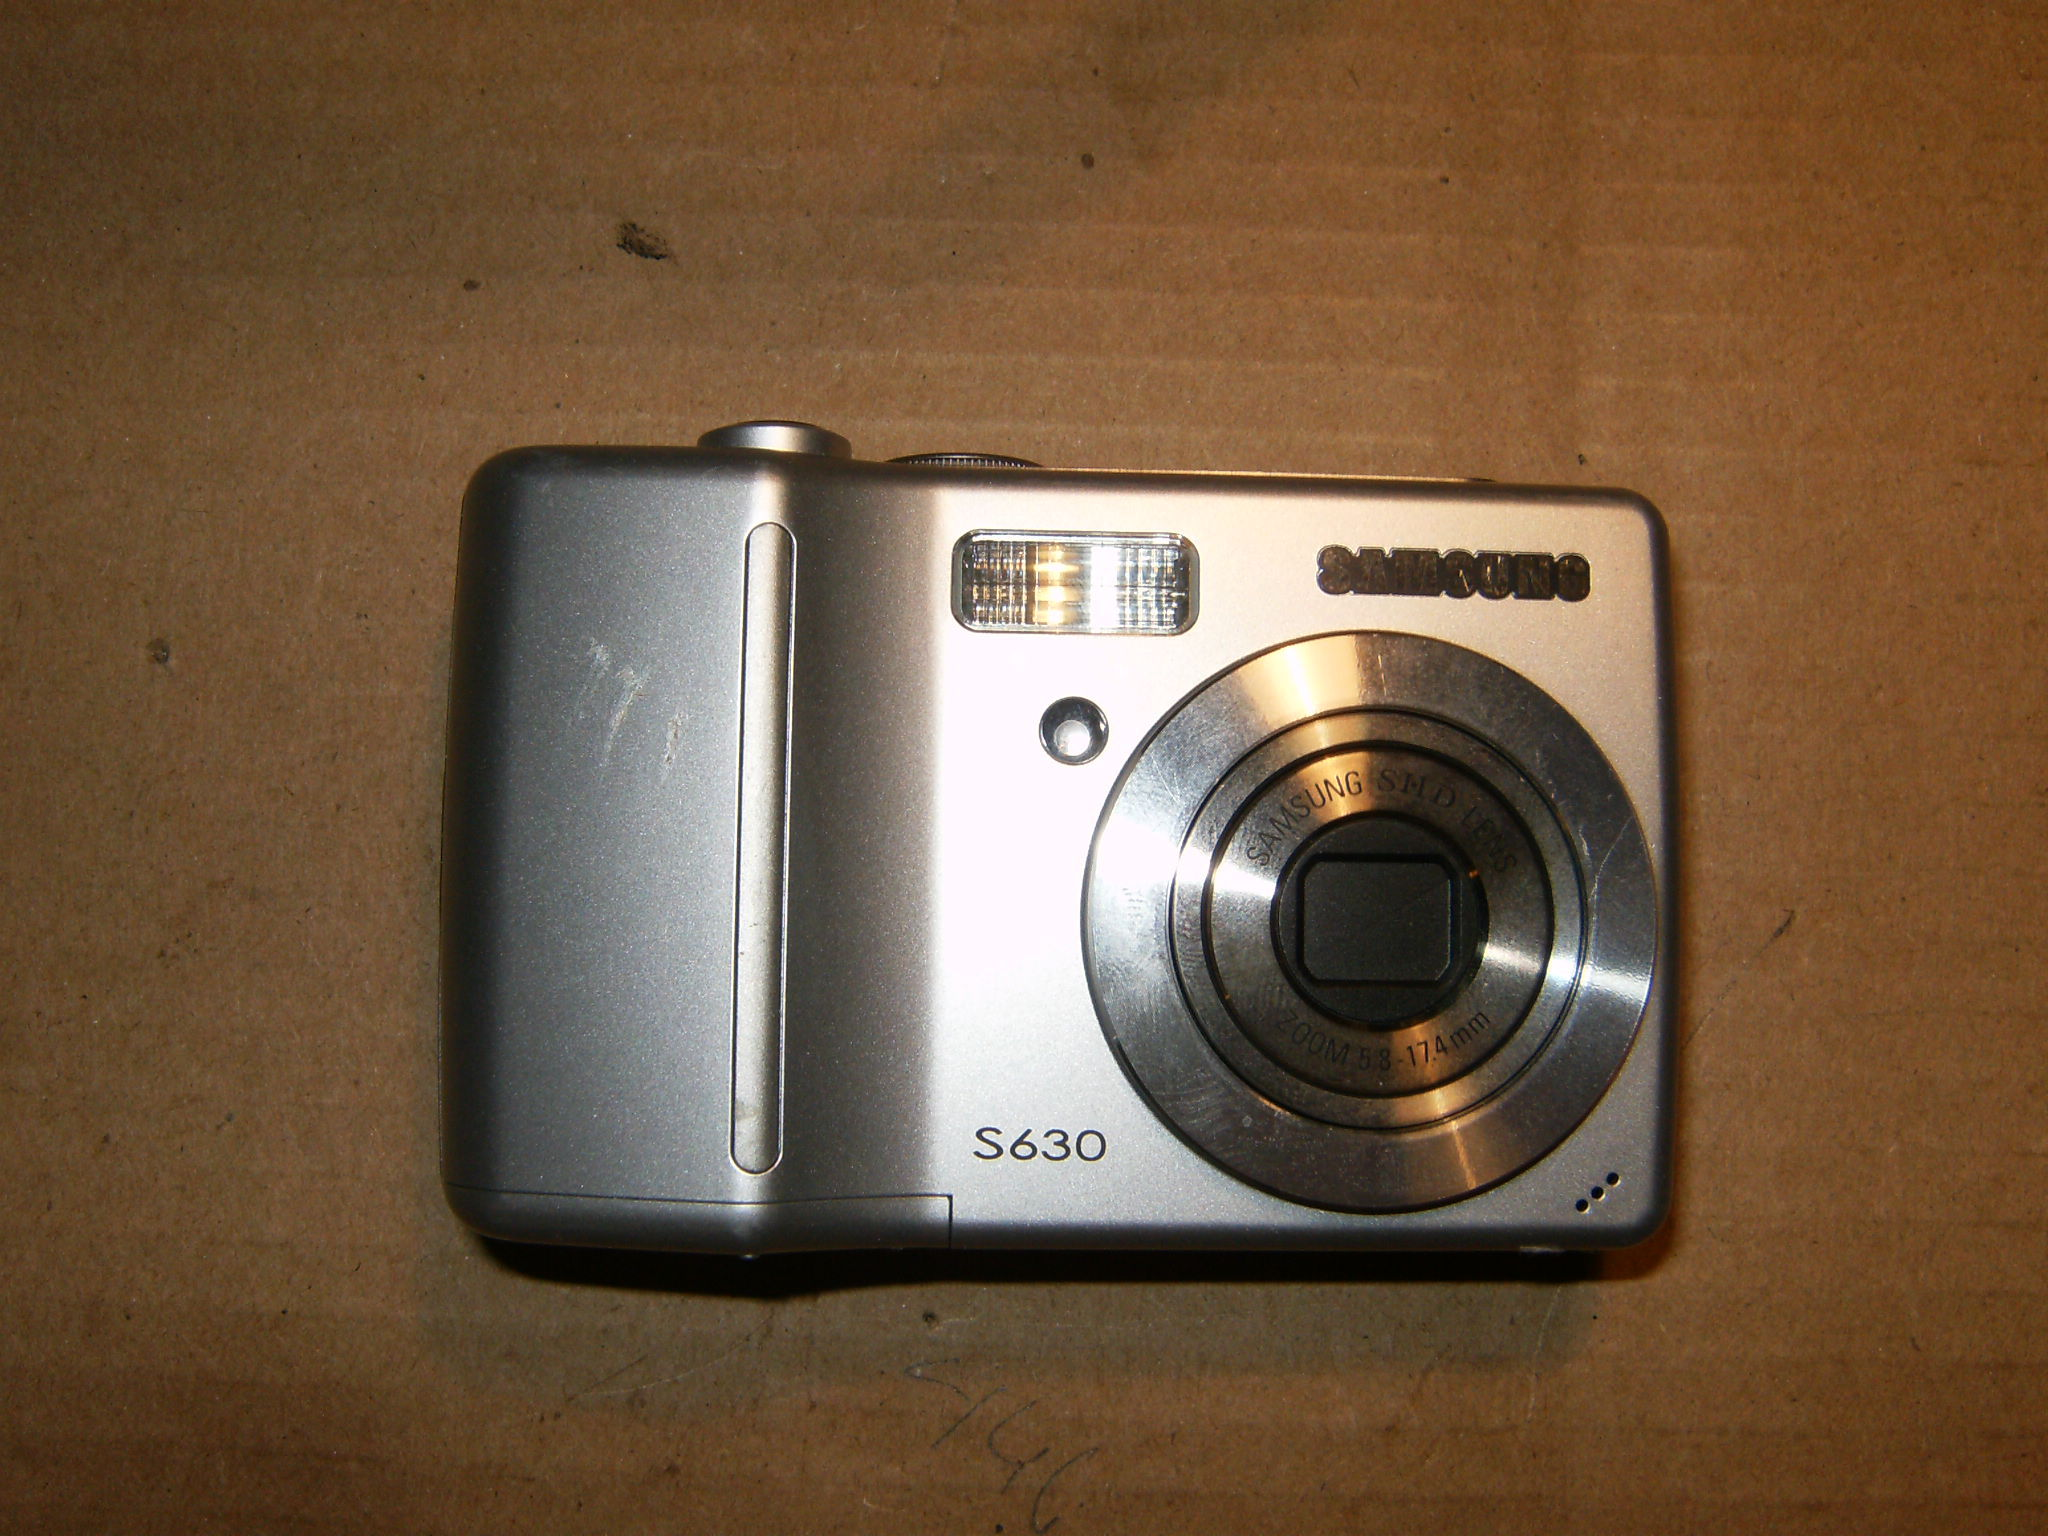 samsung s630 repair ifixit rh ifixit com Samsung S830 Samsung S360